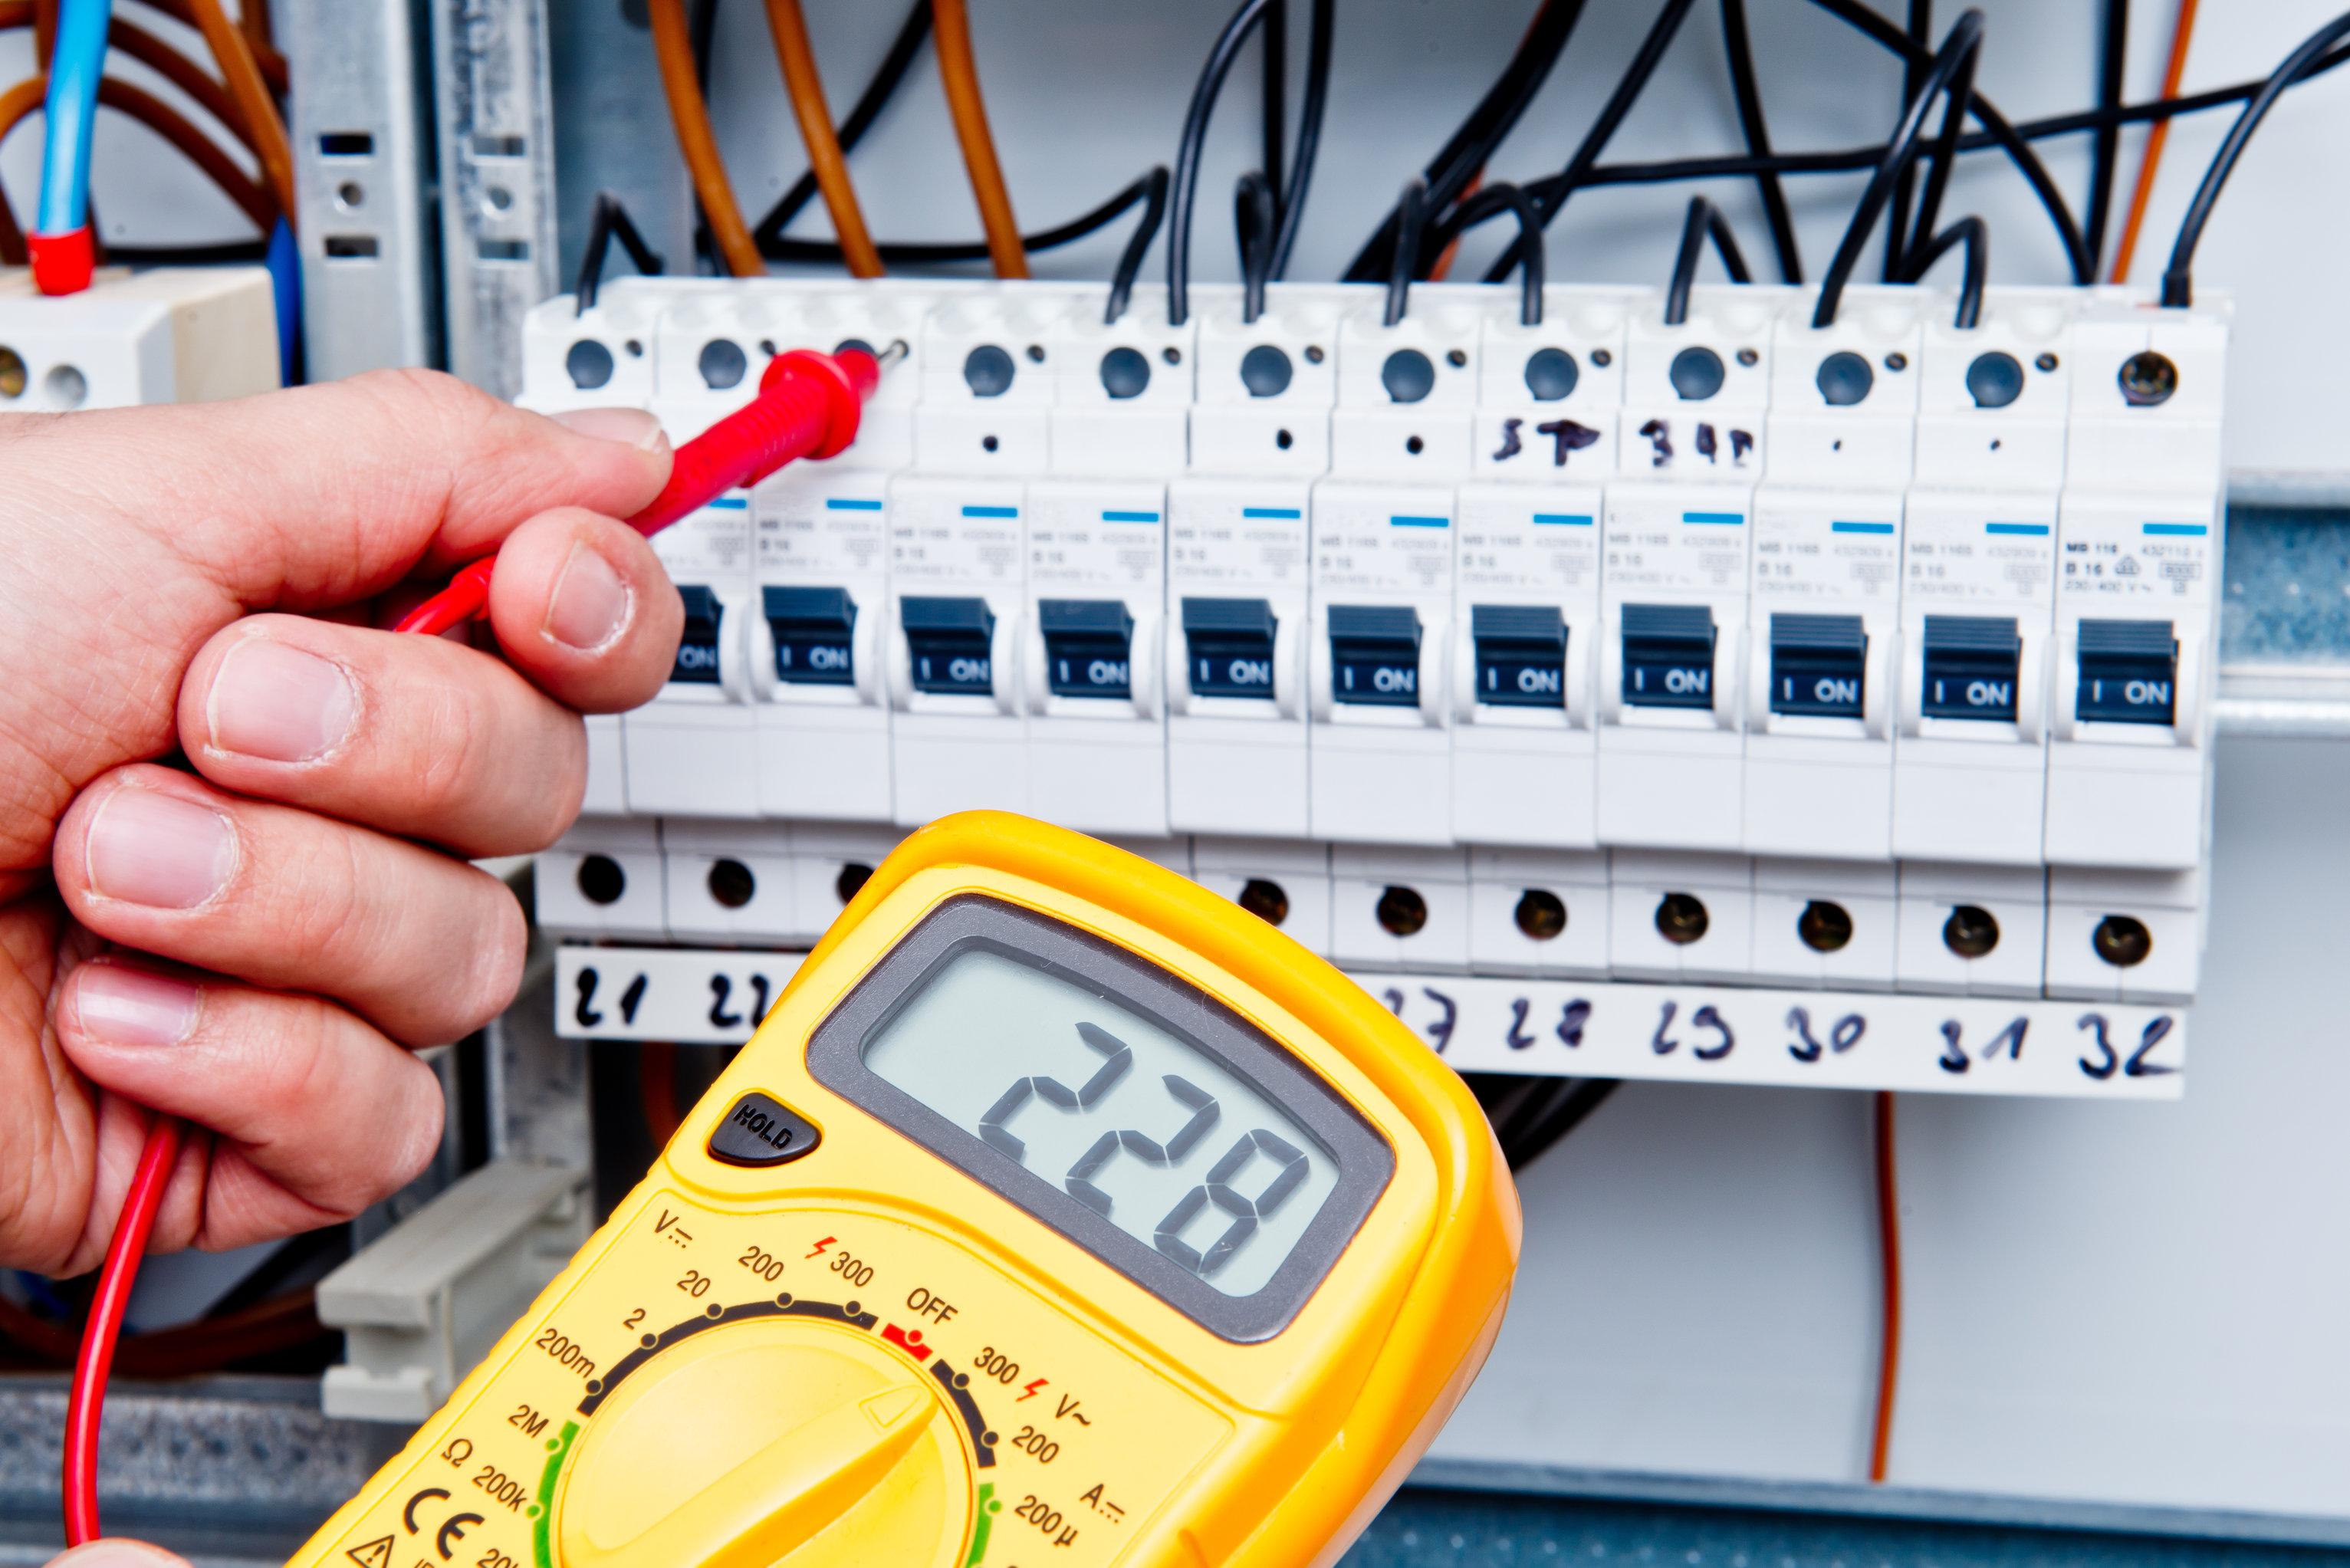 Digitales Messgerät an Sicherungskasten